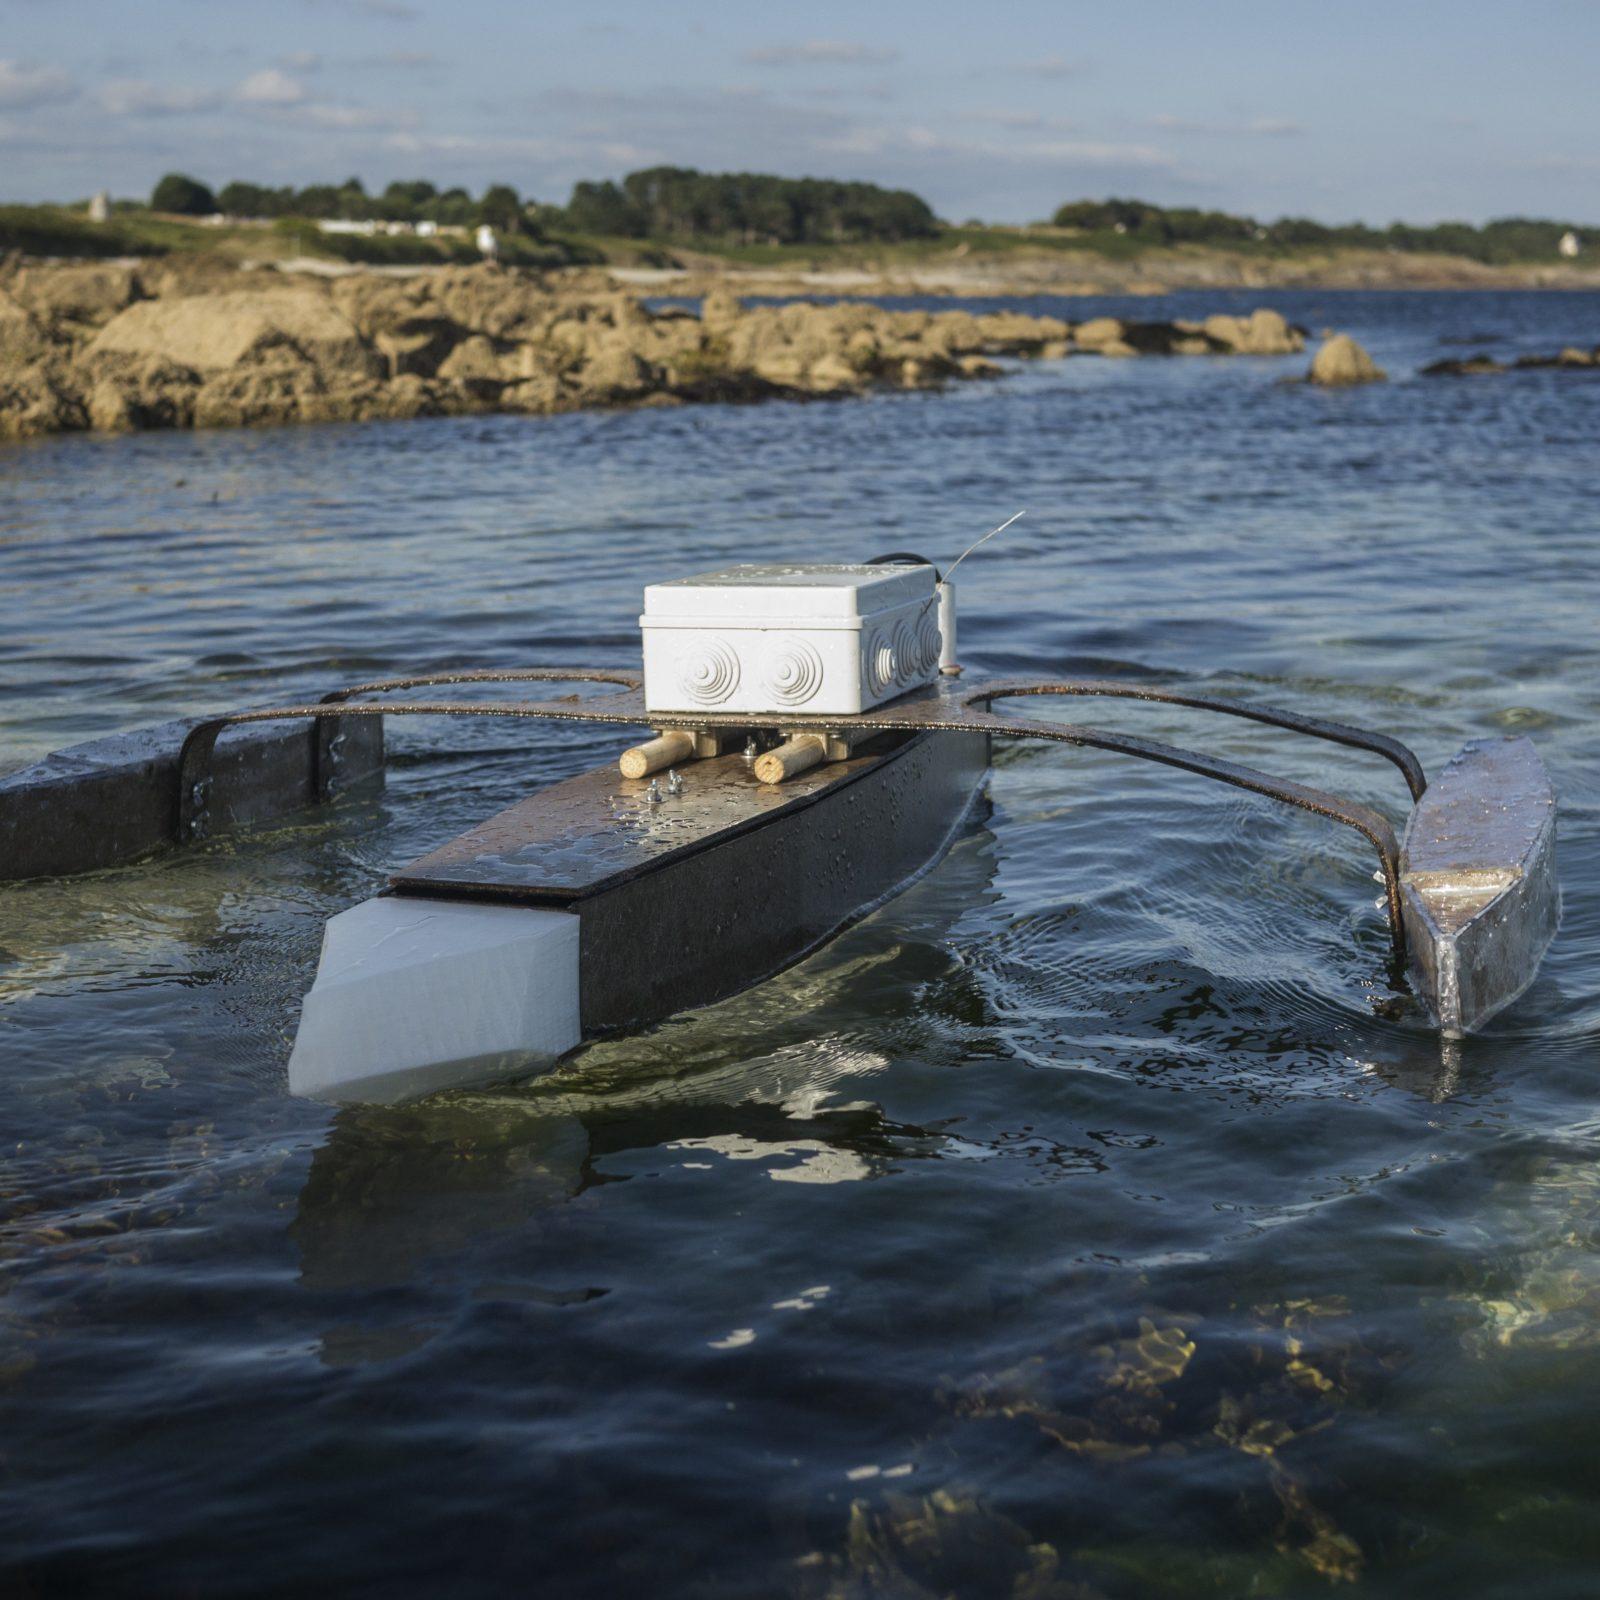 Drone Ocean is open - carré